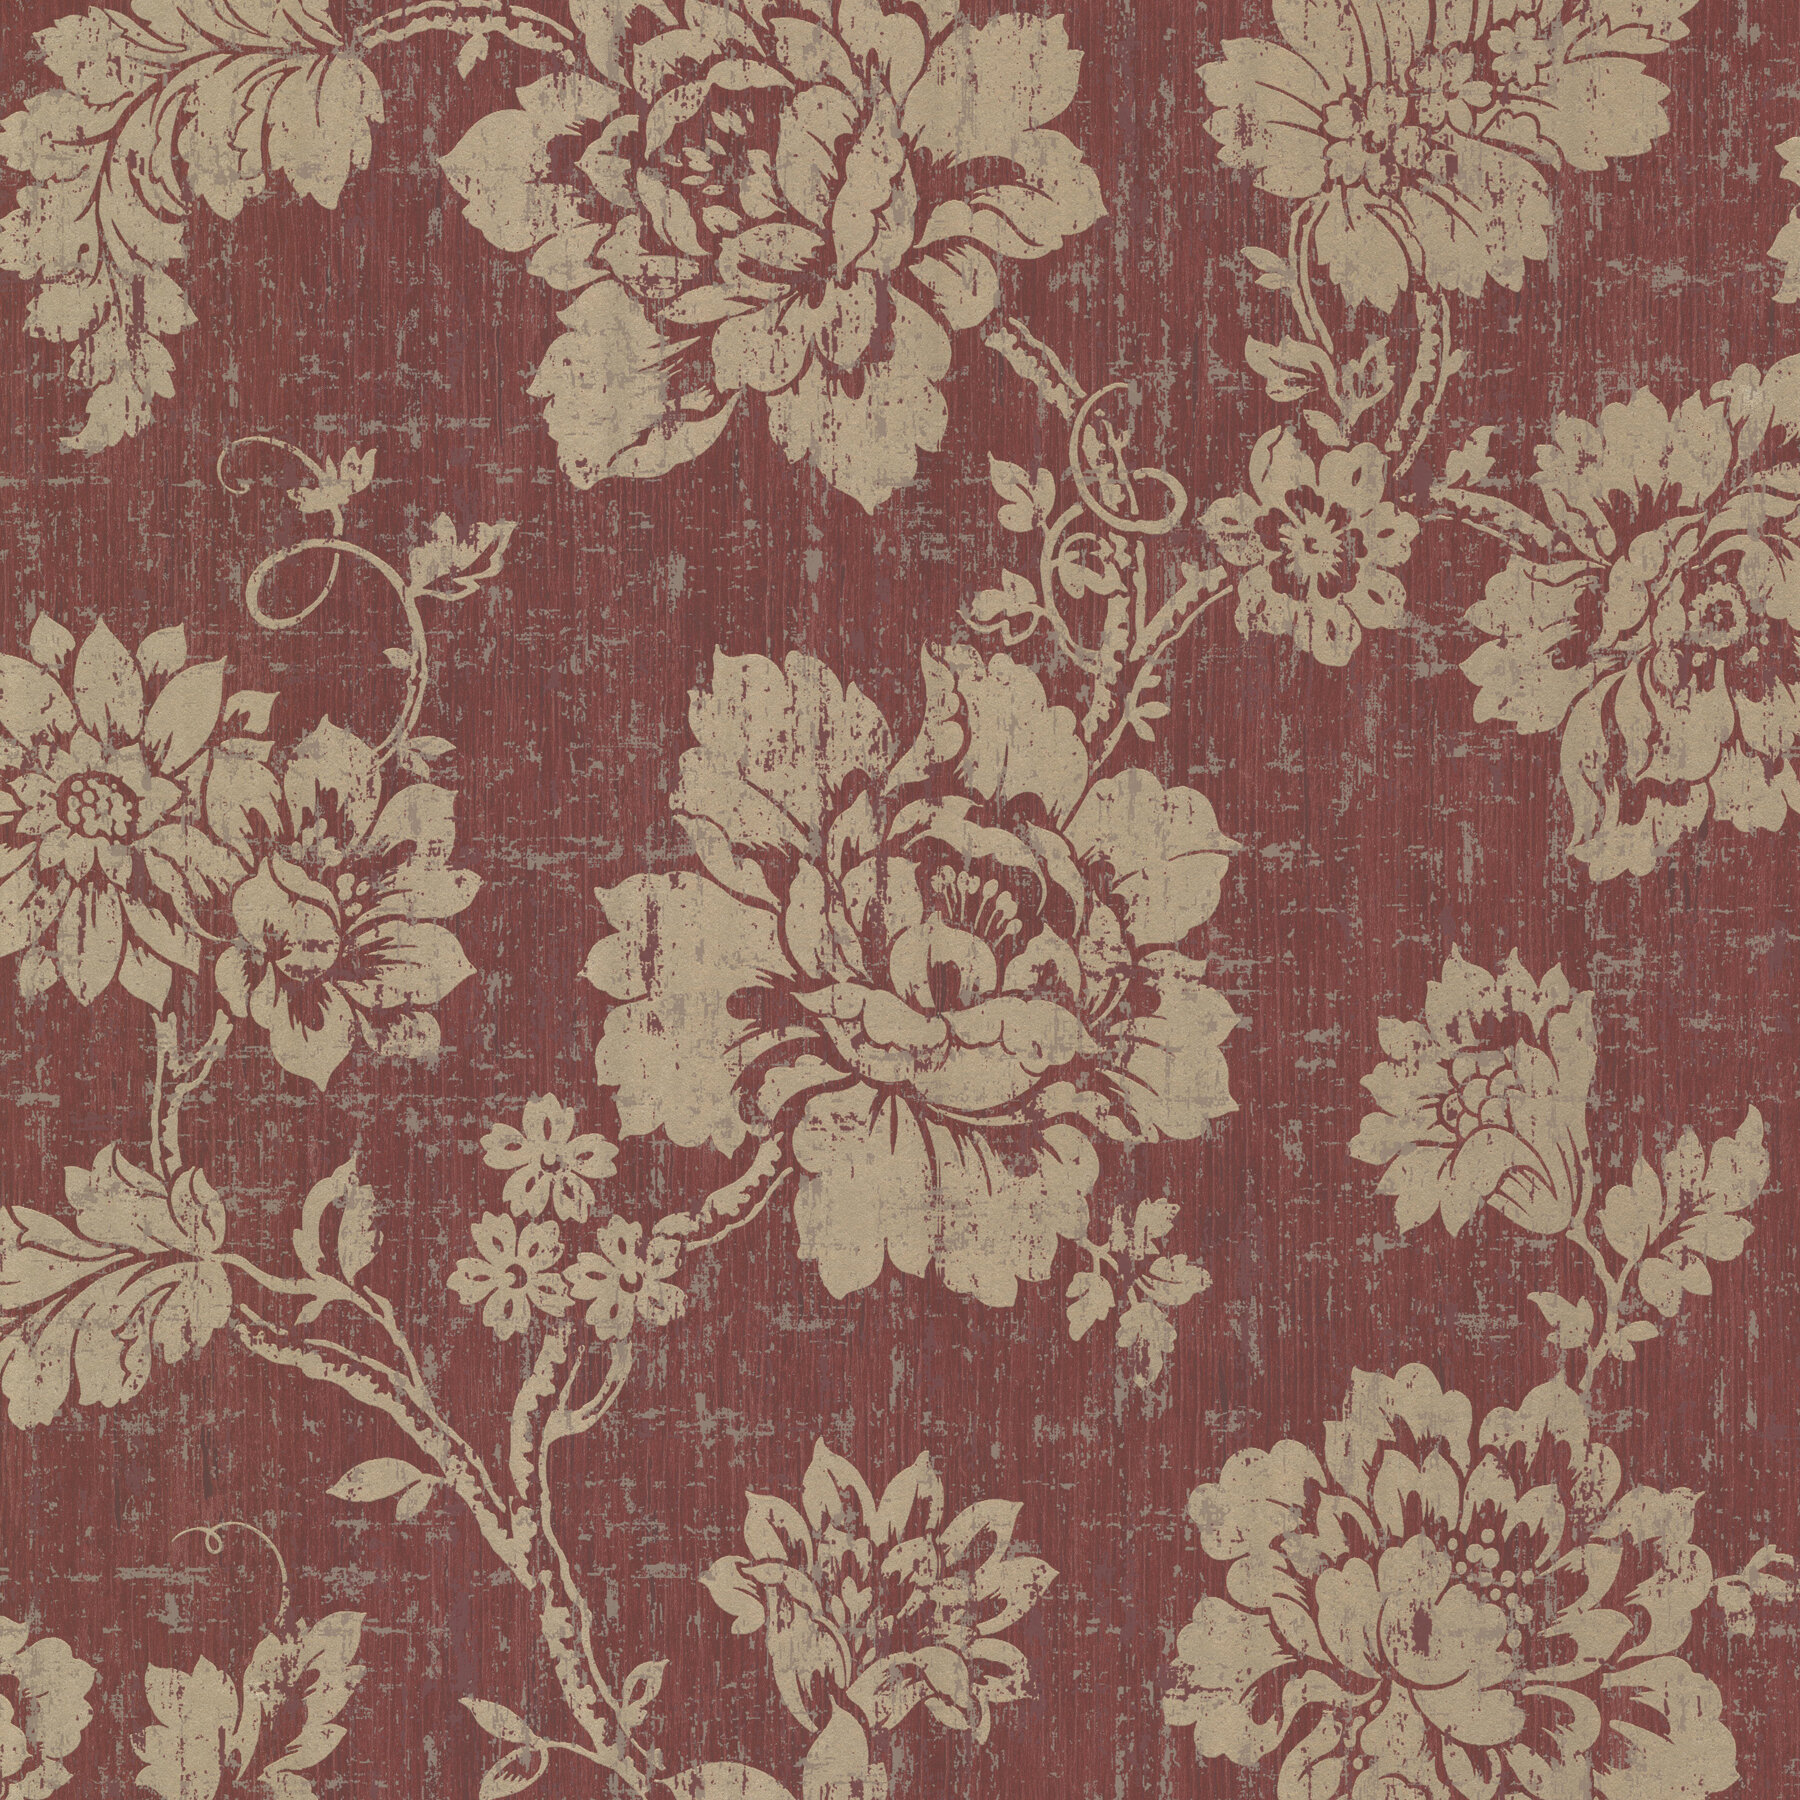 Brewster Home Fashions Onyx Giardina Trail 33 X 20 5 Floral 3d